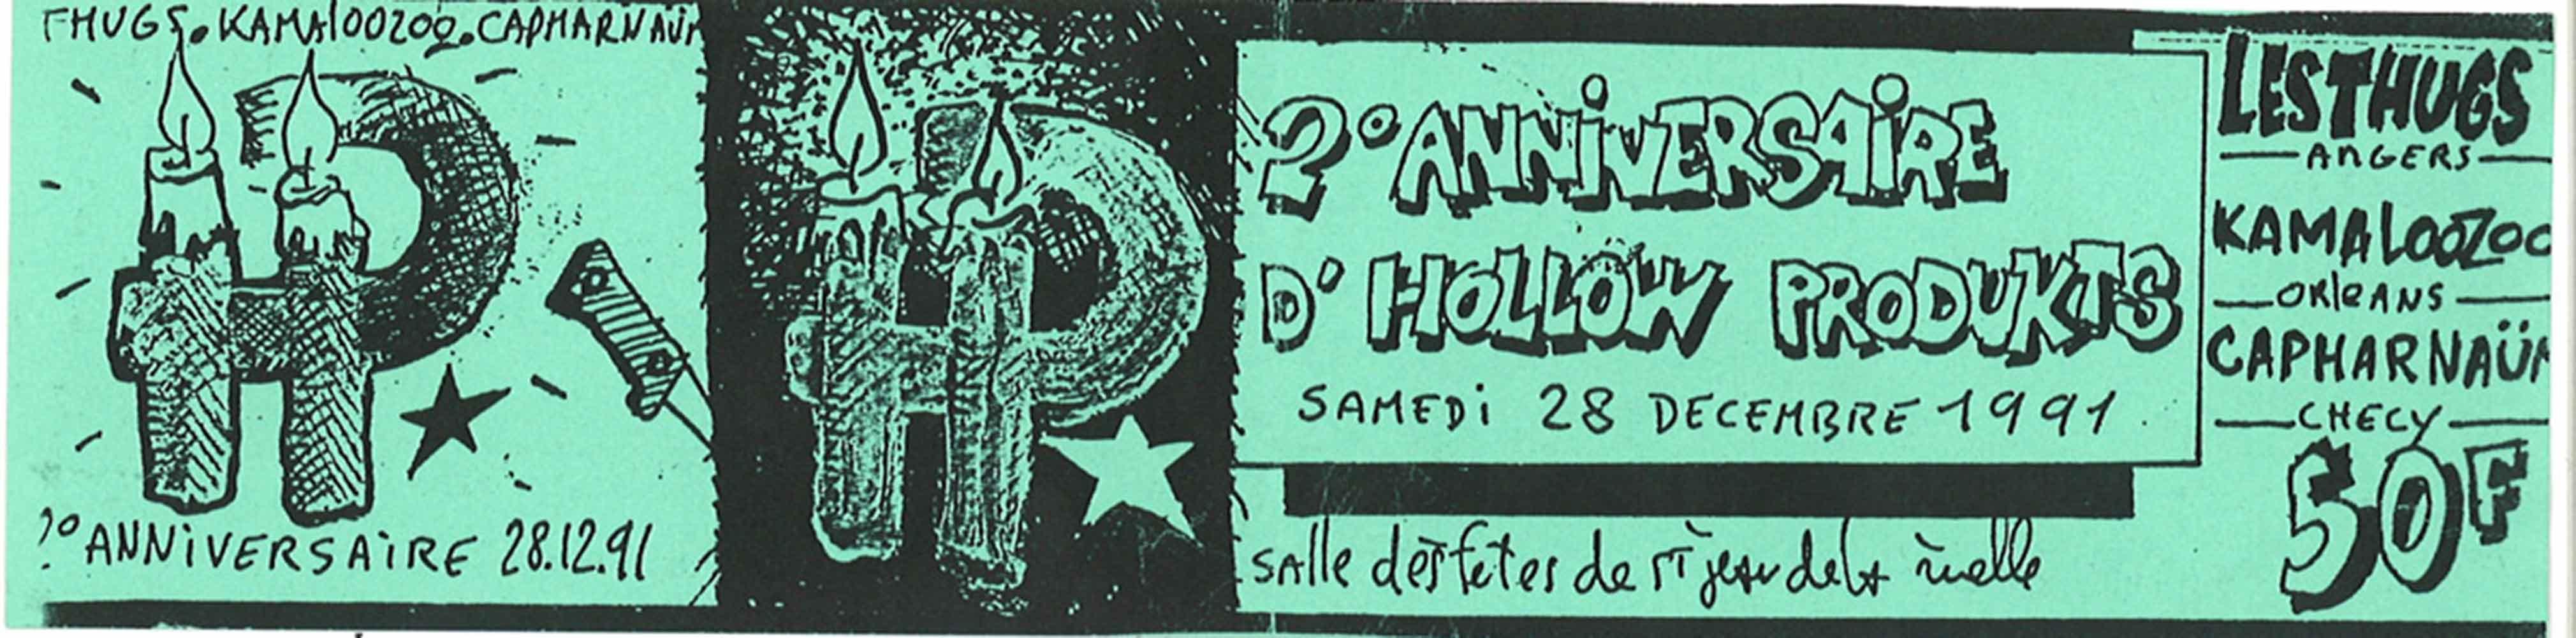 1991_12_28_Ticket